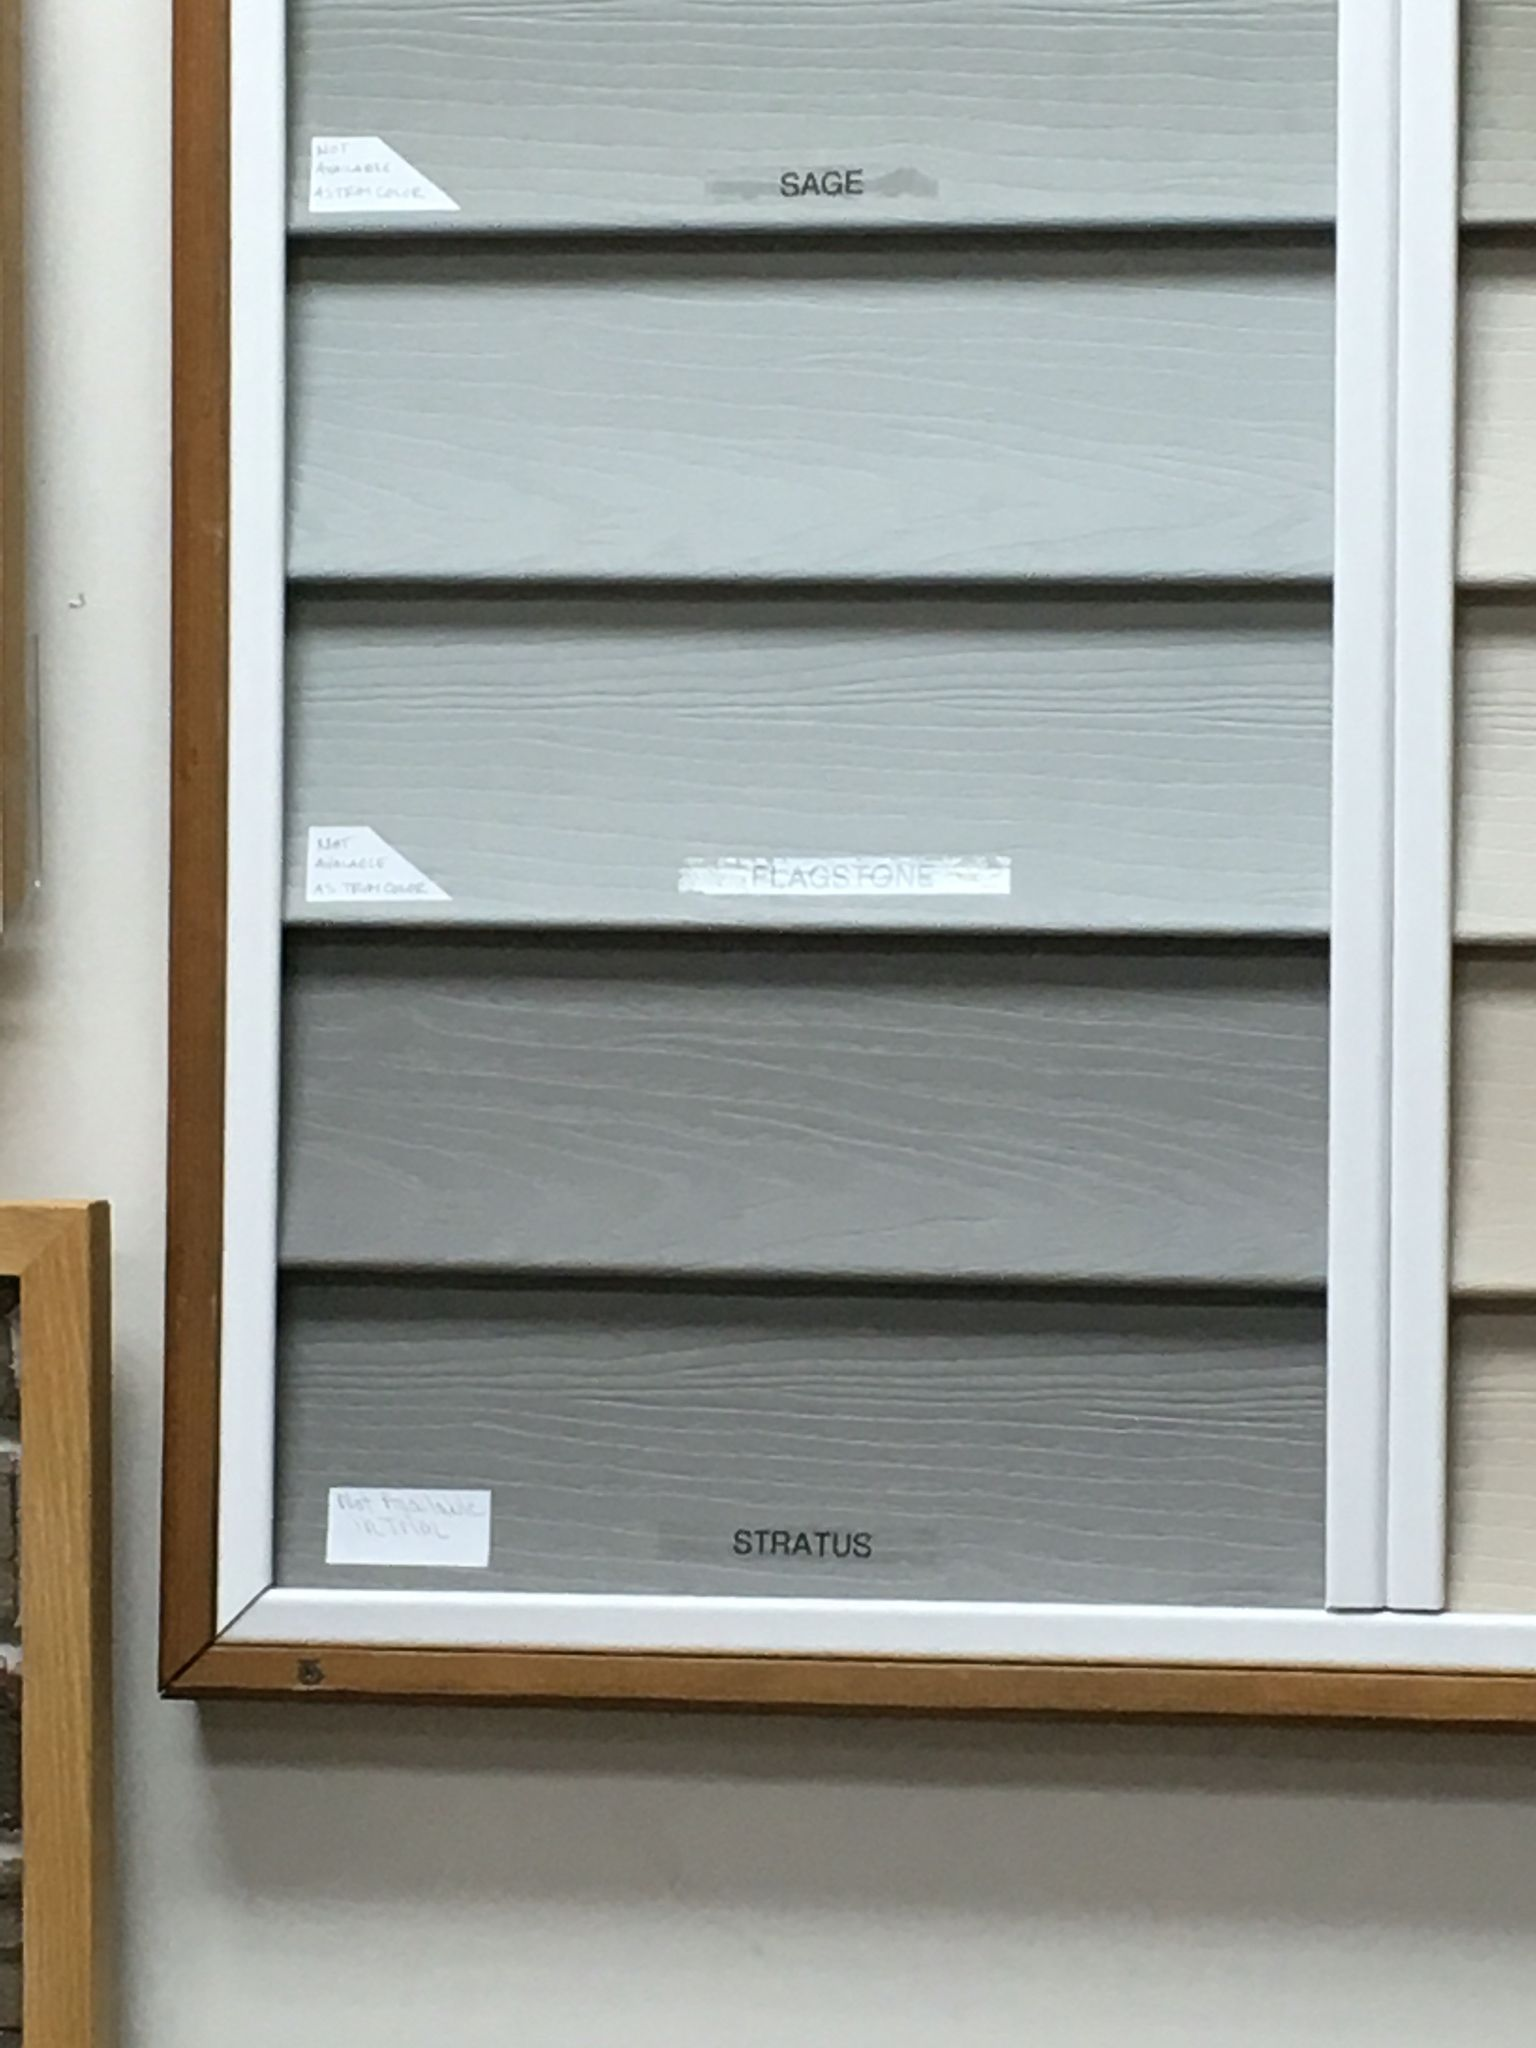 Exterior Siding Stratus Flagstone Vinyl Siding House Siding Exterior Siding